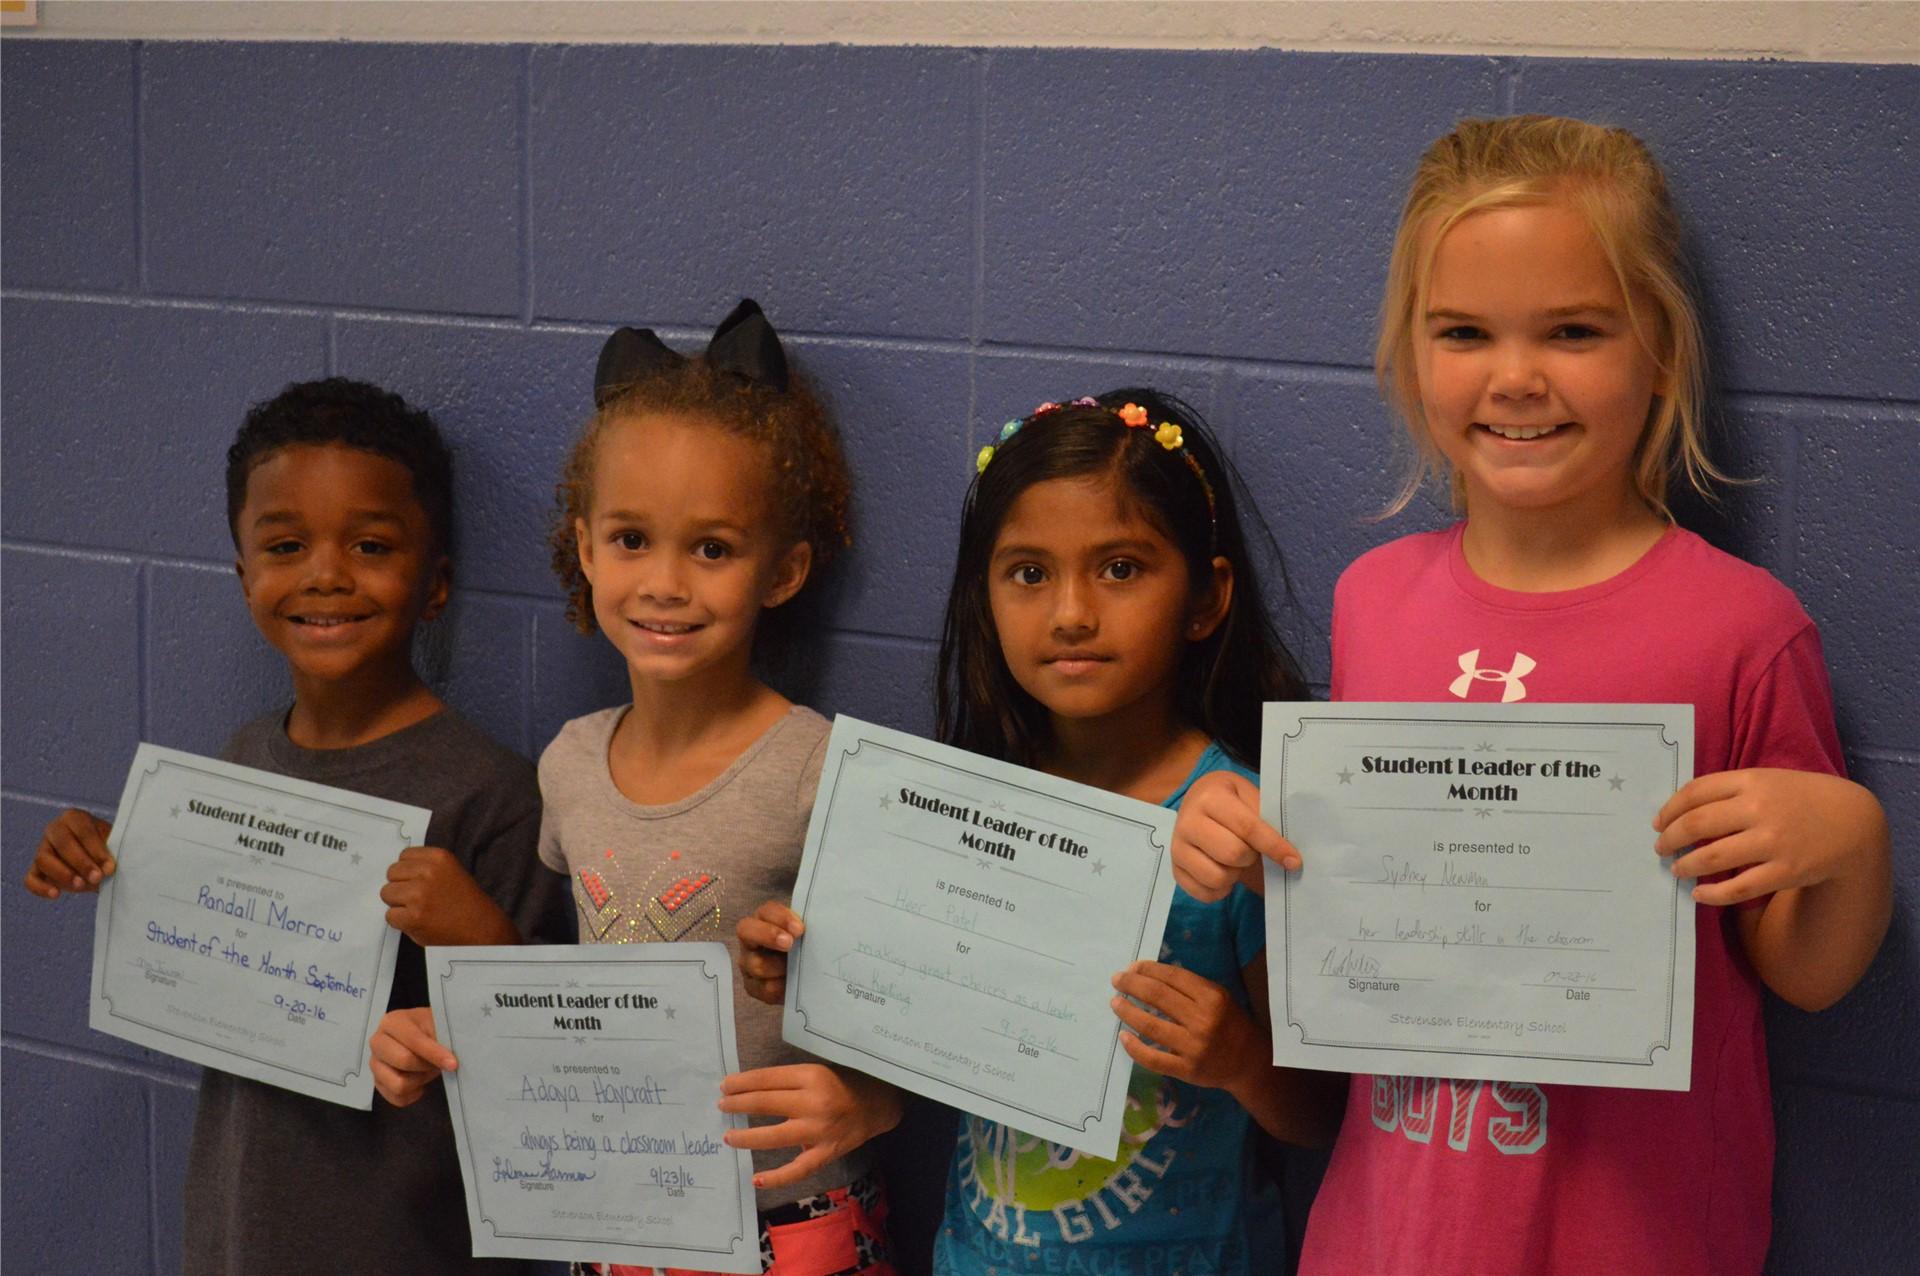 (L-R) Kindergartener, Randall Morrow; 2nd graders:  Adaya Hayacraft, Heer Patel, Sydney Newman